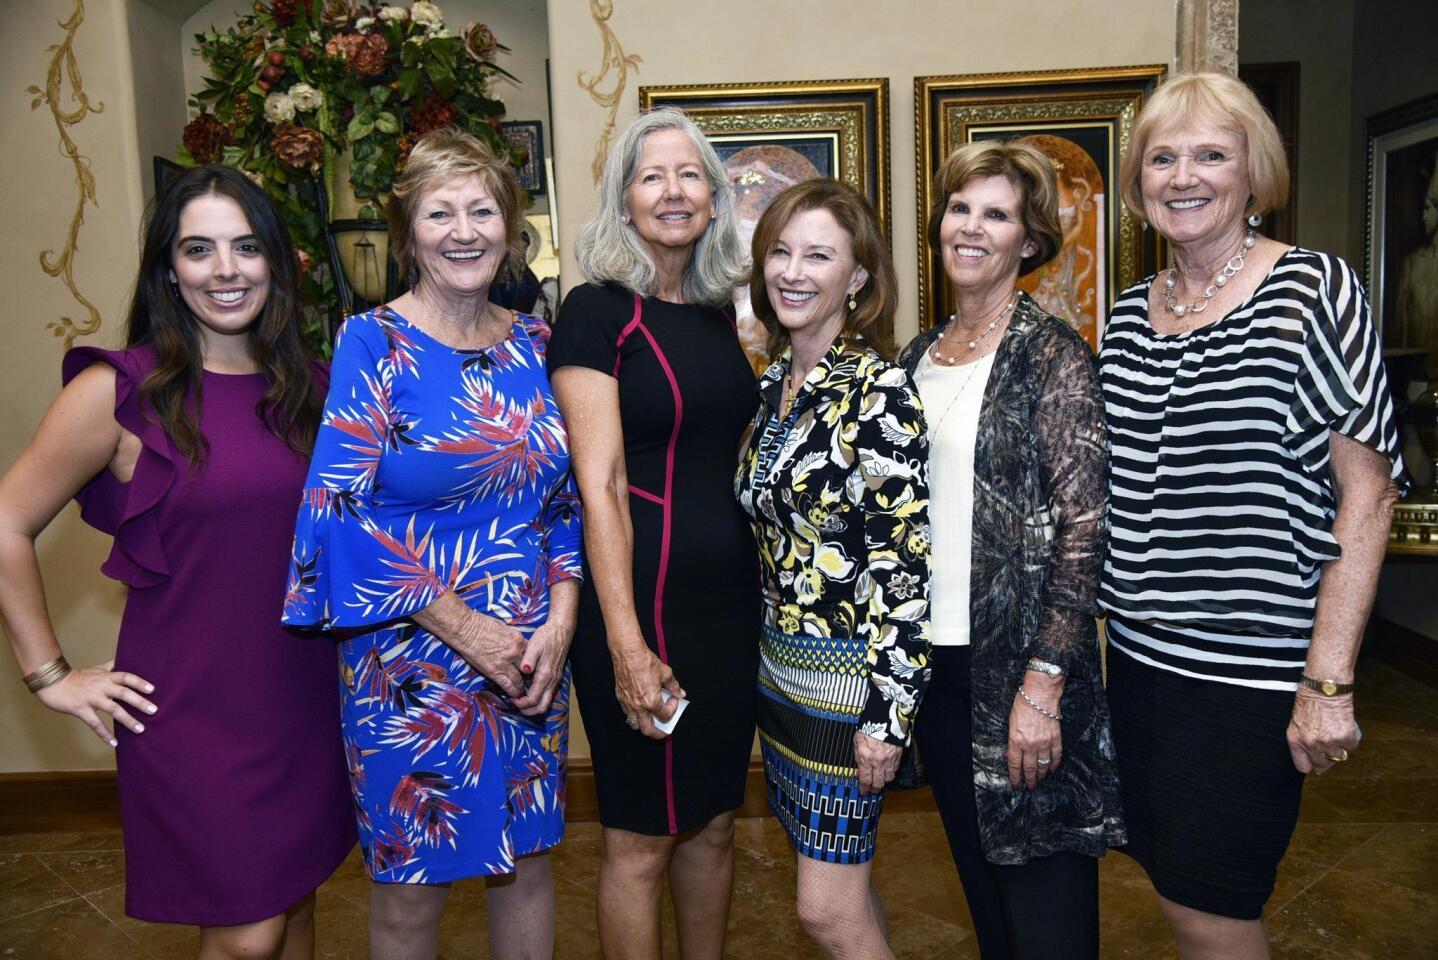 Dreamkeepers board members Alexis Ranglas-Behseta, President Sandi Chenoweth, Secretary Debbie Weiner, Maureen Billington, CFO/Treasurer Pat Konkle, Vice President Pat Gregory